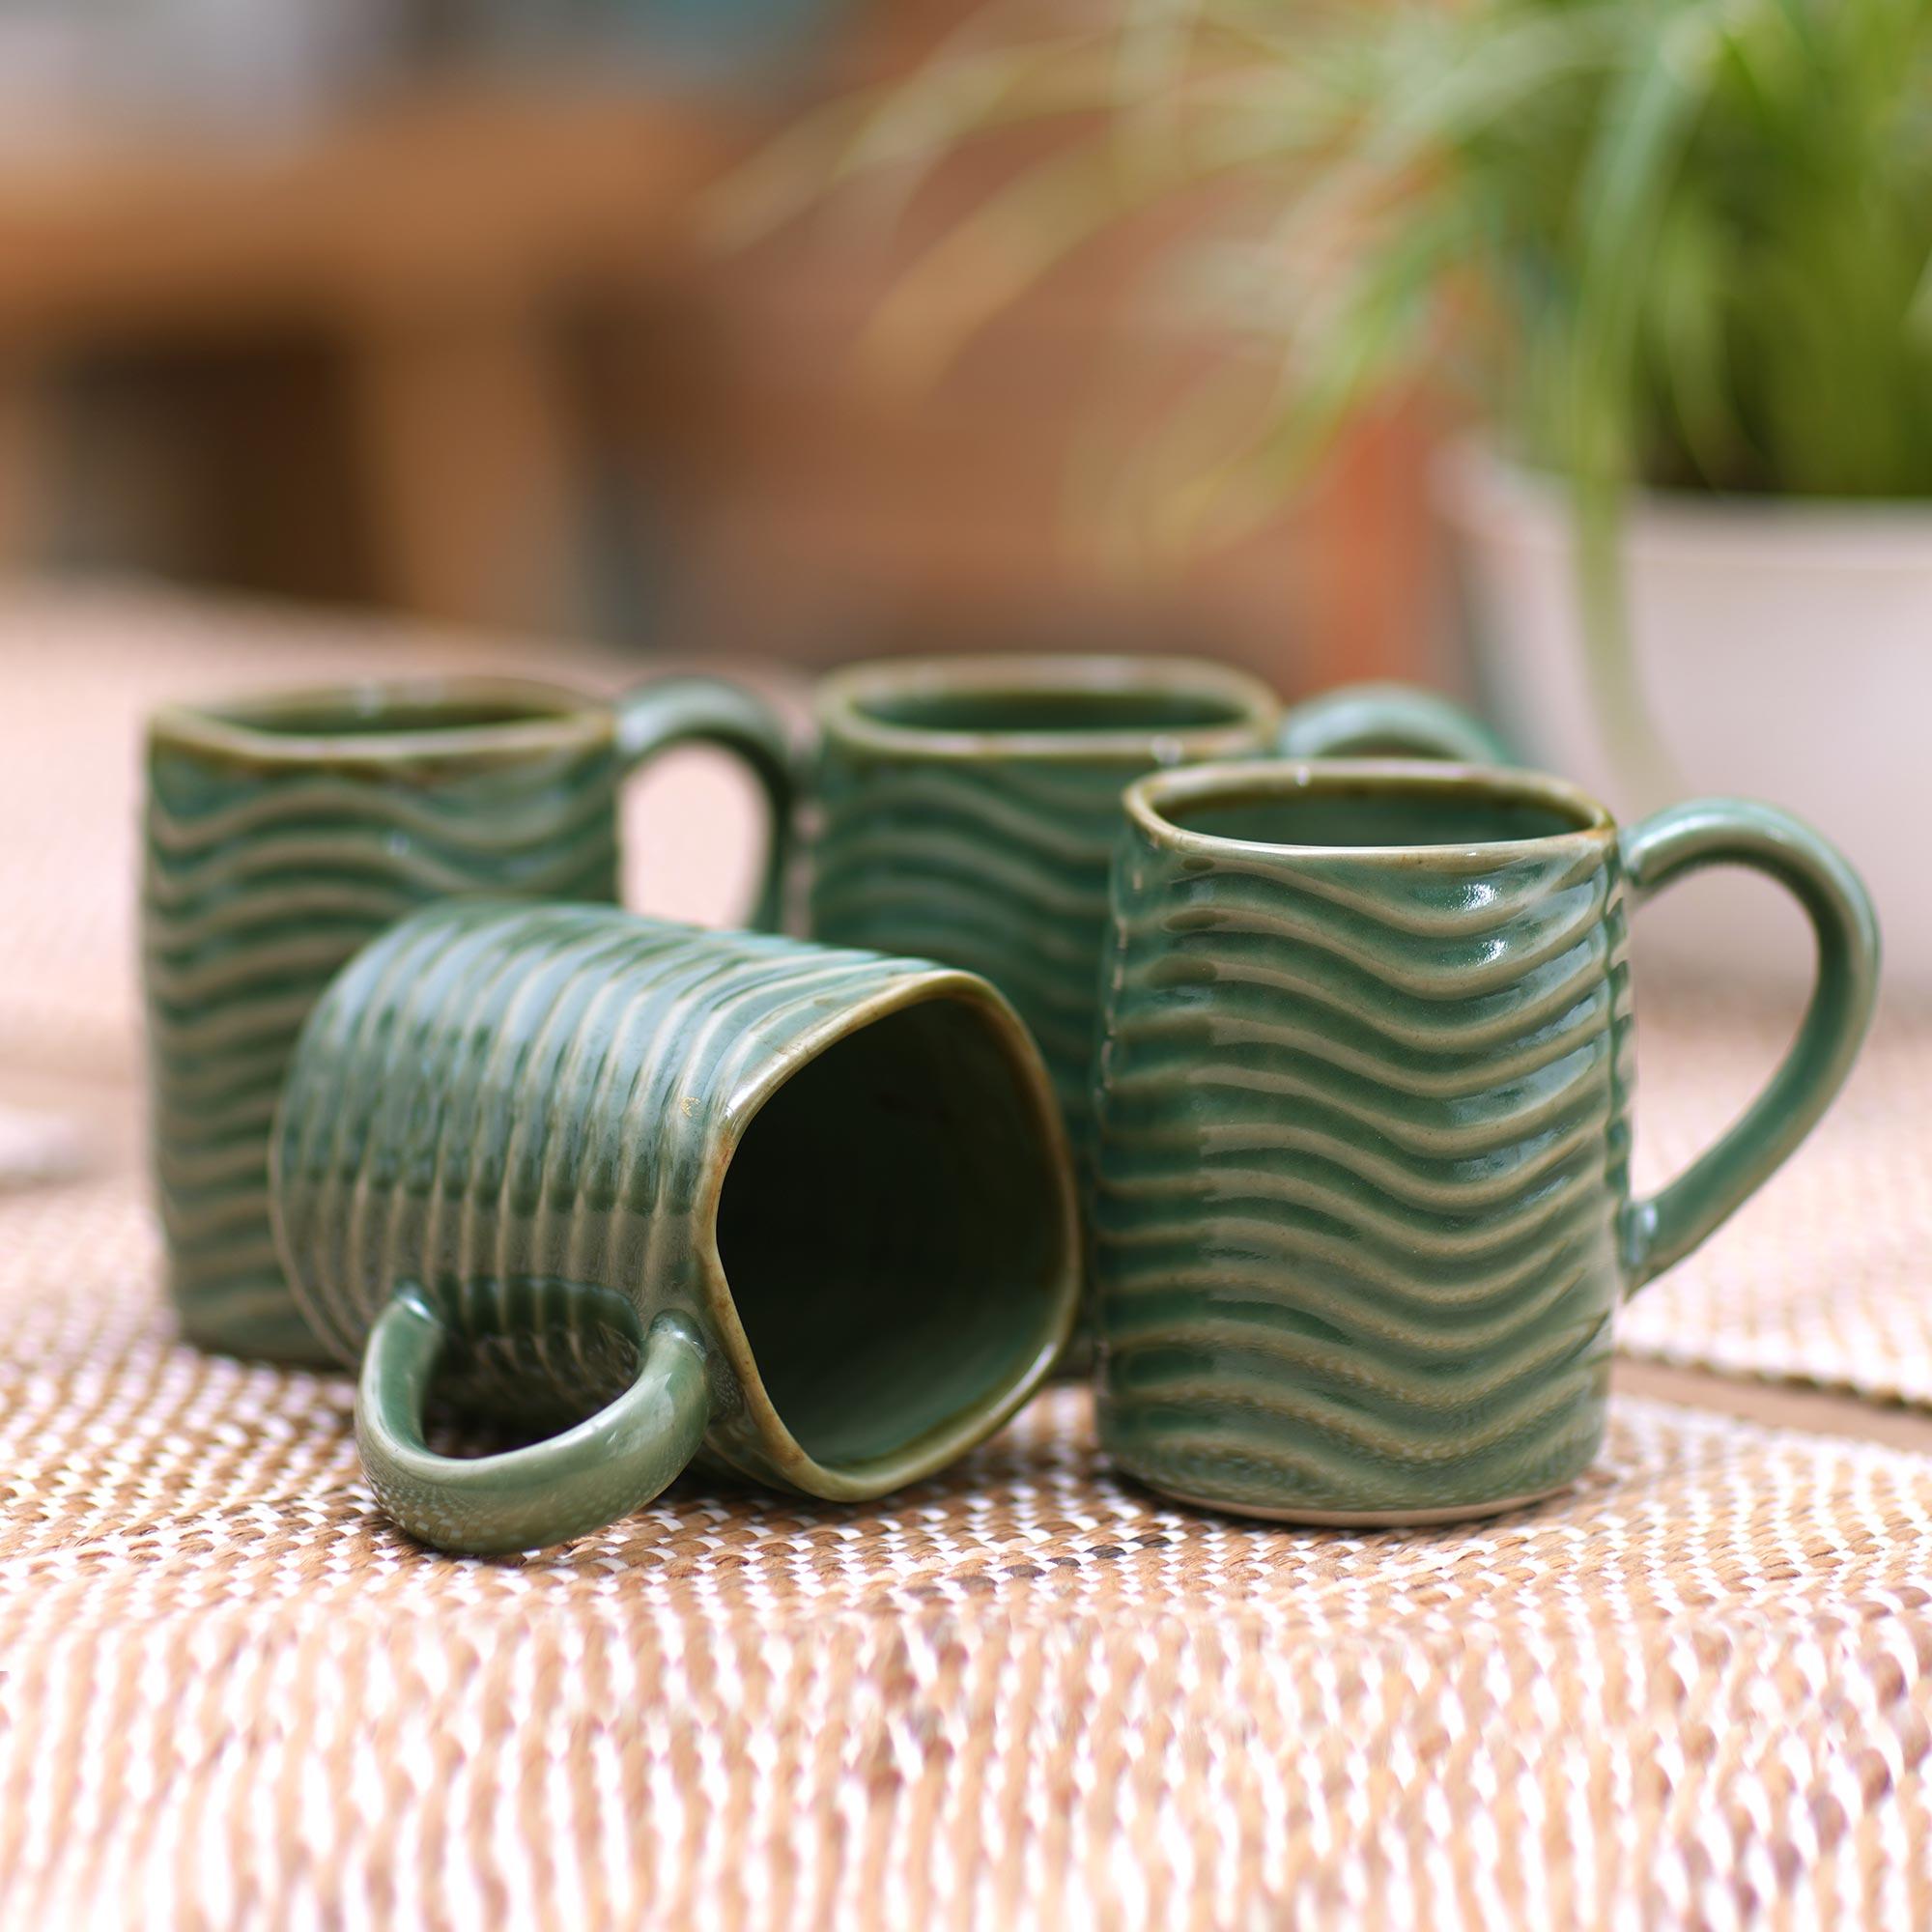 Green Wavy Wall Brown Rim Ceramic Mugs from Bali (Set of 4)